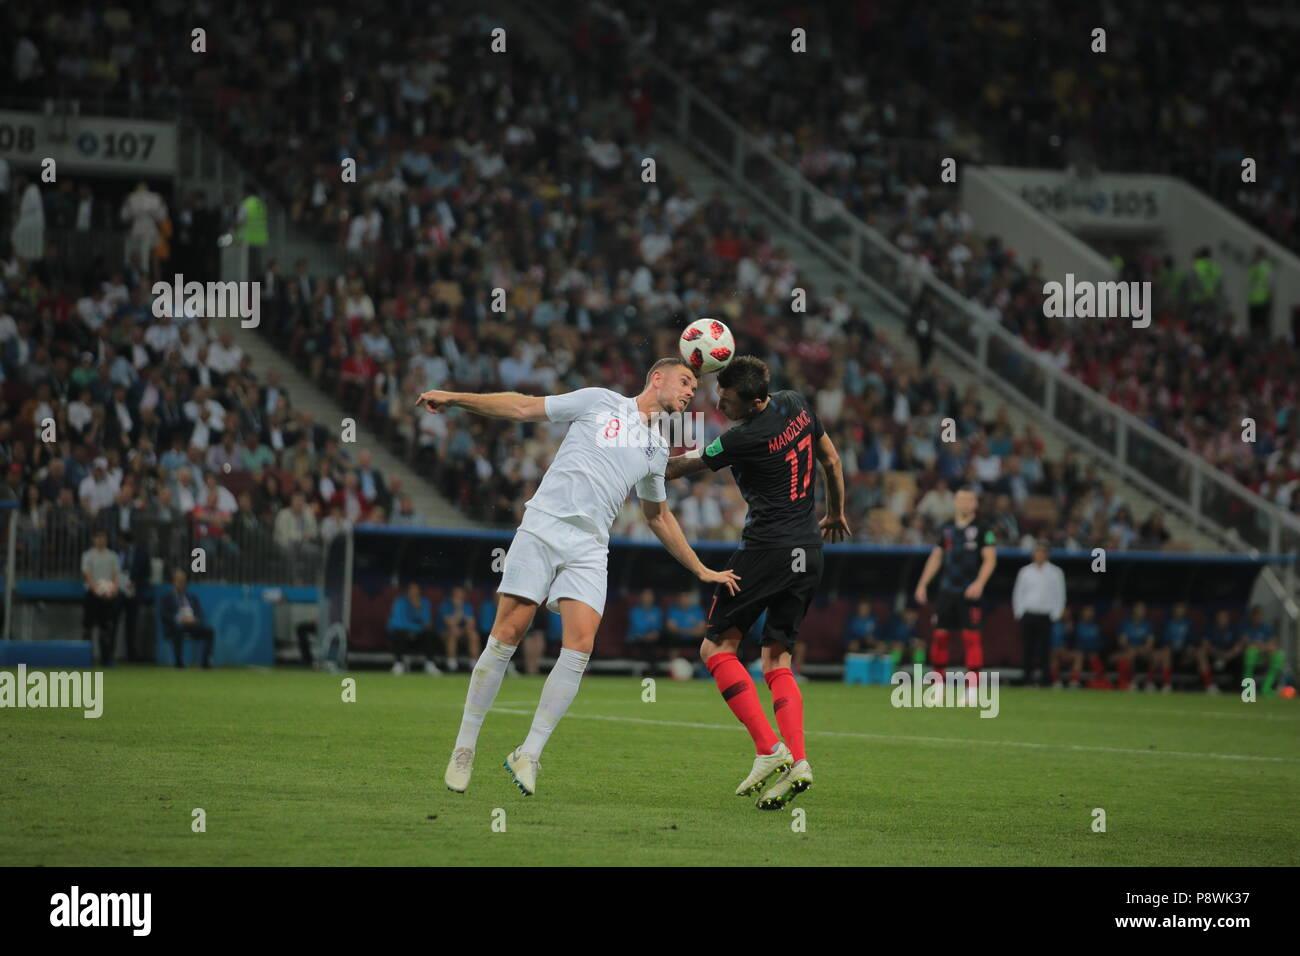 dedbb42d7a2a42 FIFA World Cup Russia 2018. Semifinals. Croatia vs England at Luzniki  Stadium. English